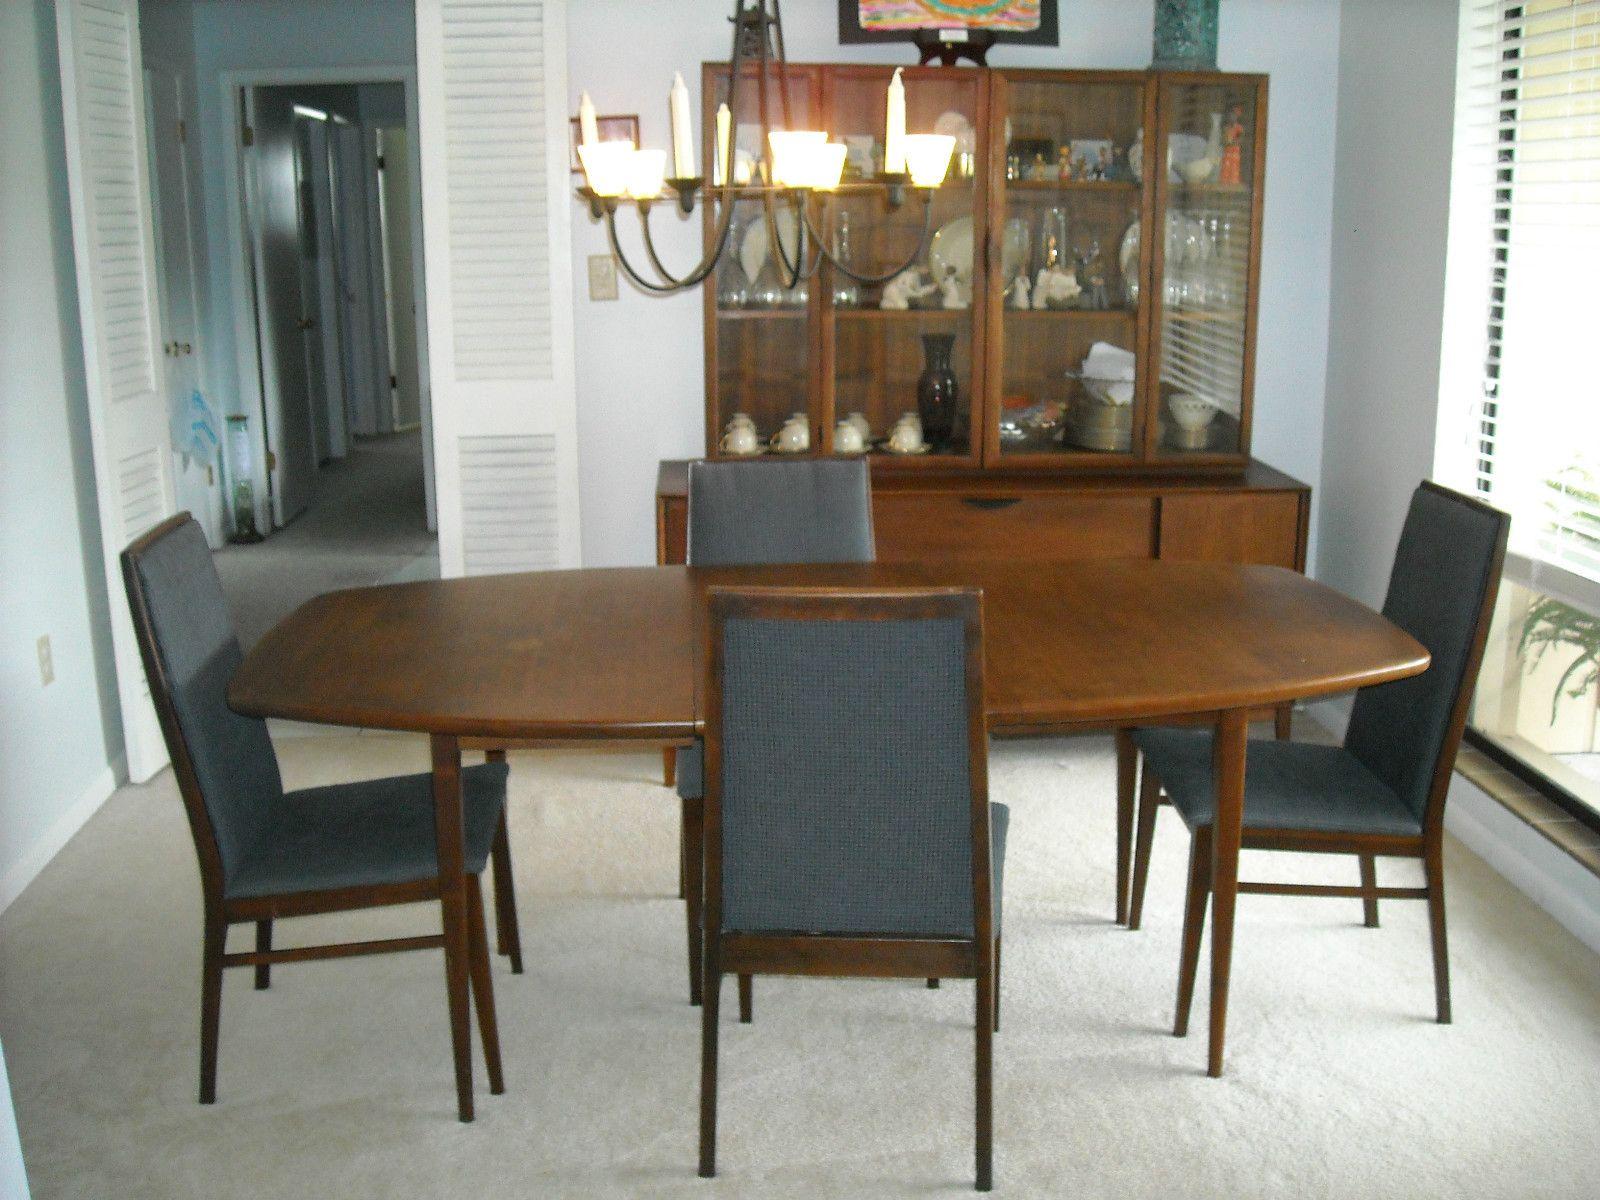 Peachy Beautiful Dillingham Danish Mid Century Modern Walnut Ibusinesslaw Wood Chair Design Ideas Ibusinesslaworg